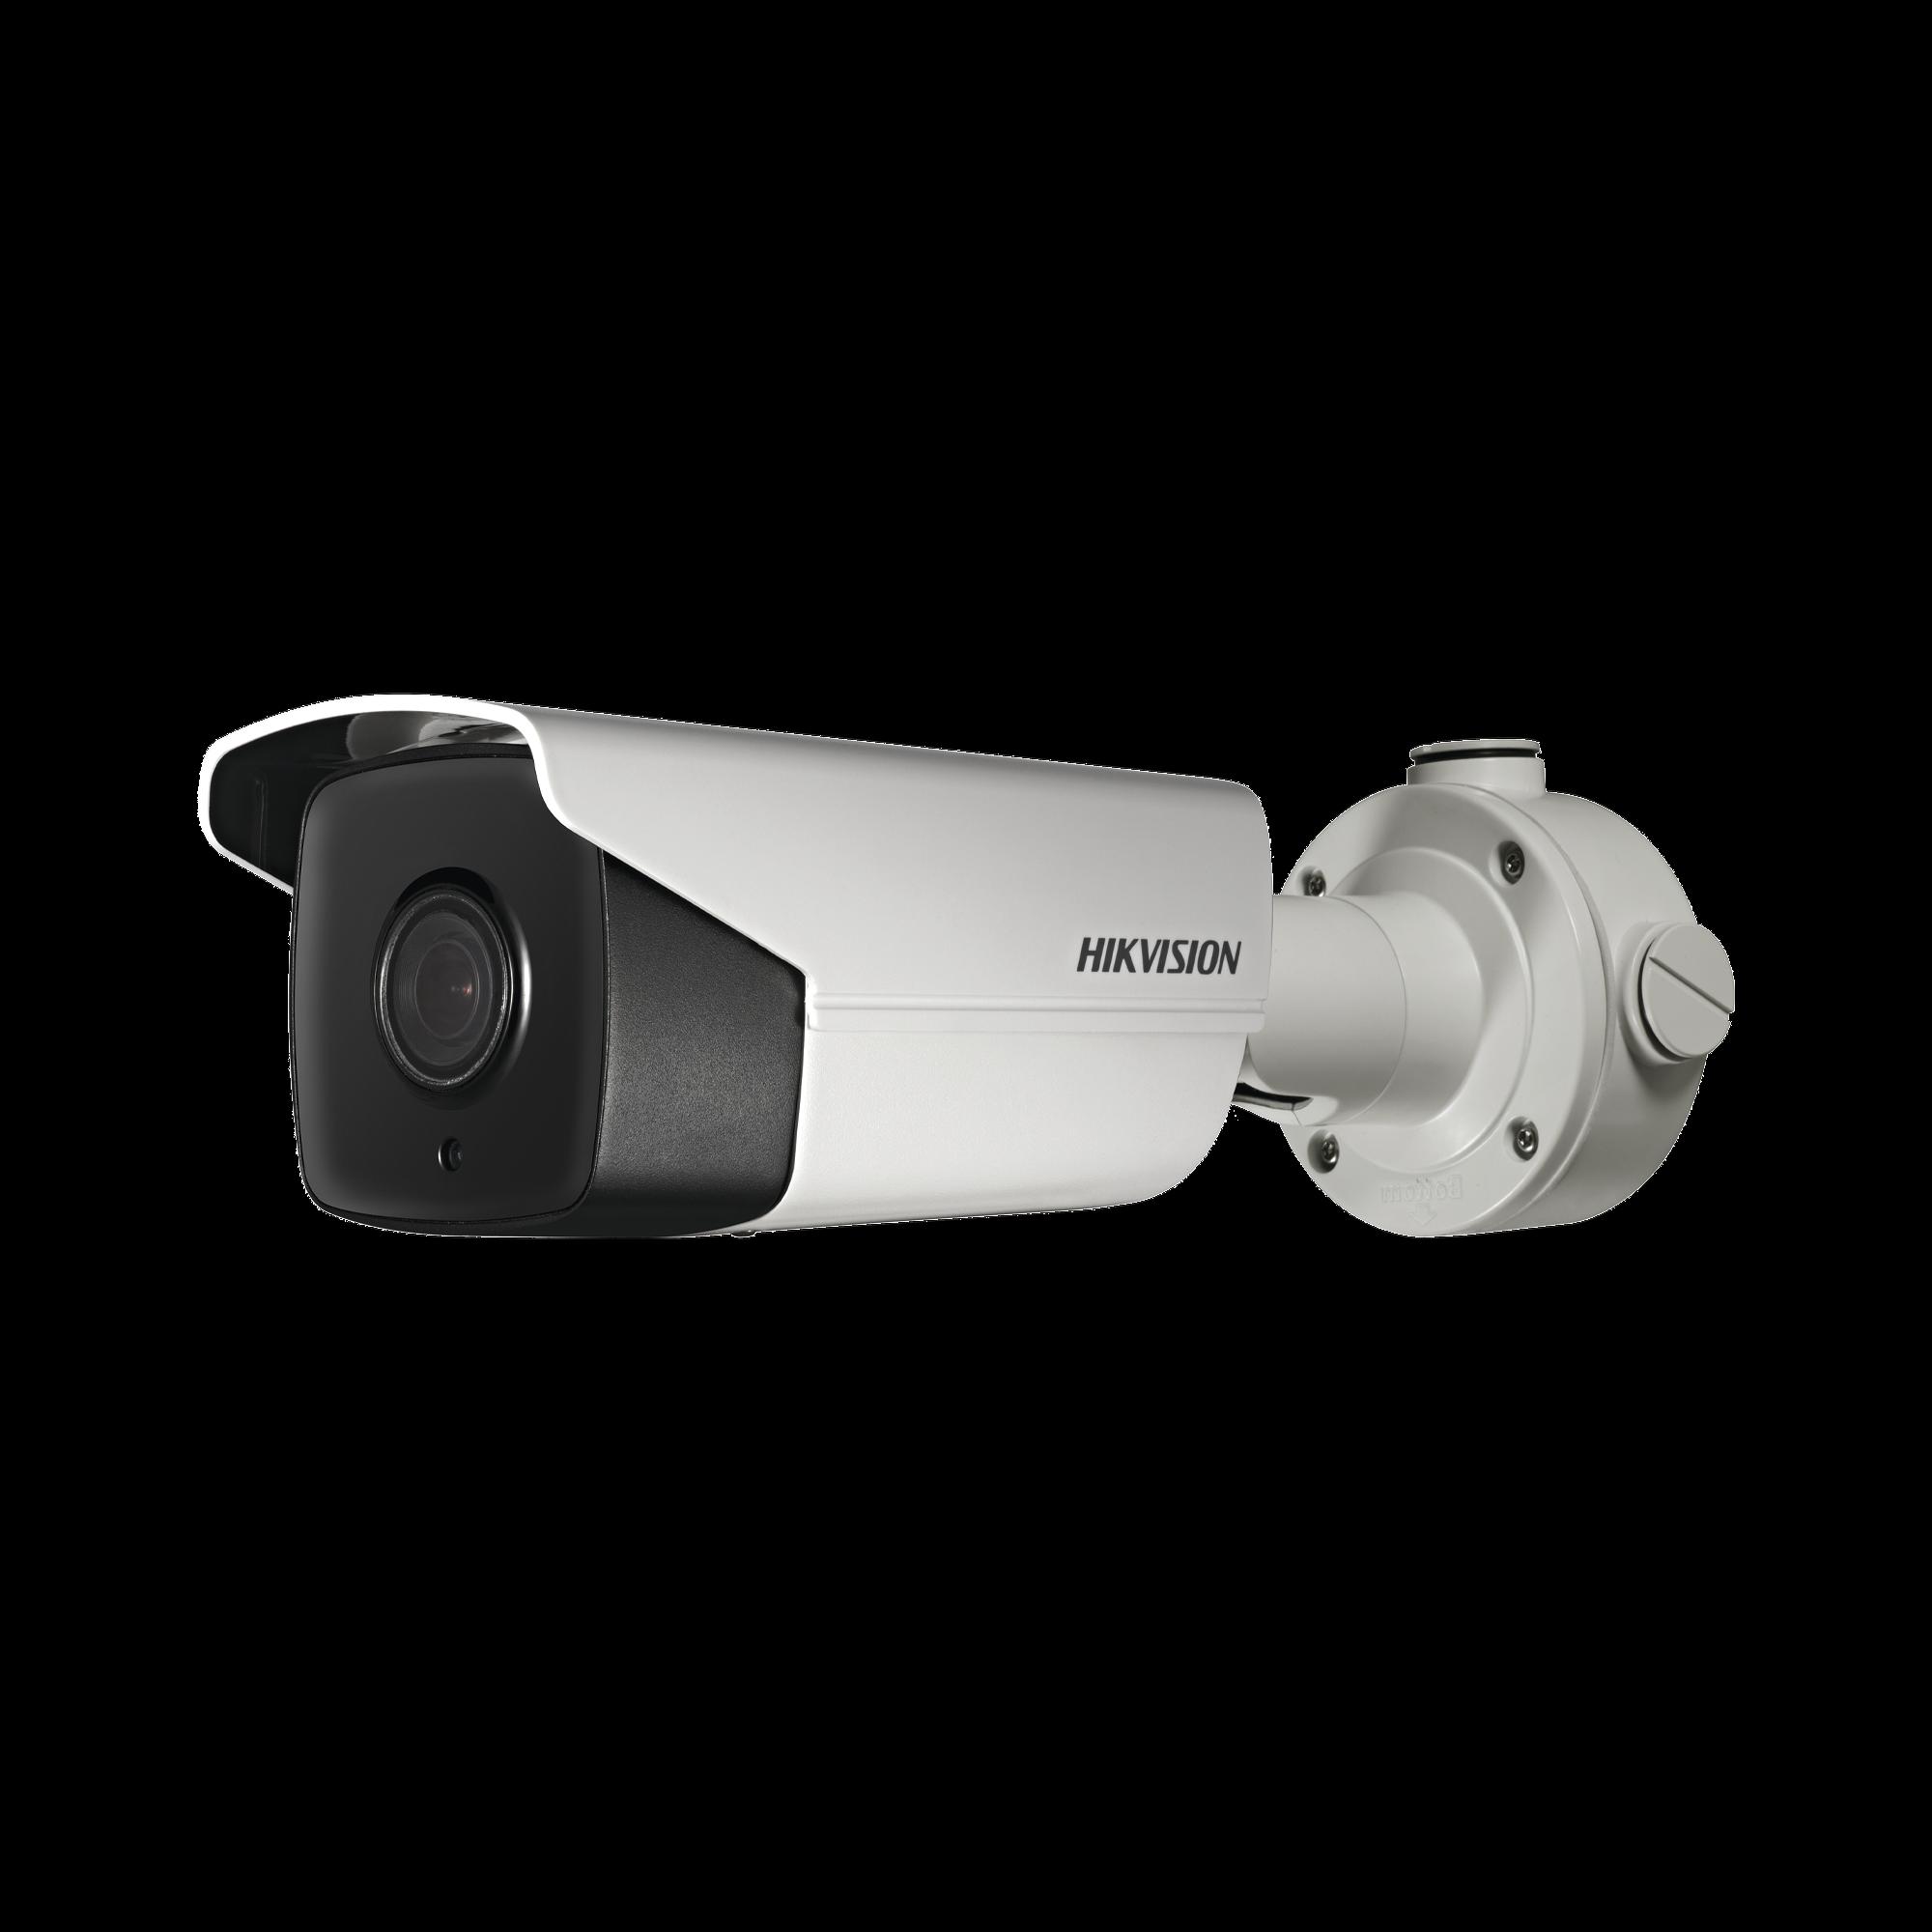 Bala IP 4 Megapixel / 20X Zoom óptico / 150 mts IR EXIR / IP67 / Conteo Objetos / Detección Rostros / EIS / H.265+ / WDR 105dB / PoE+ / MicroSD